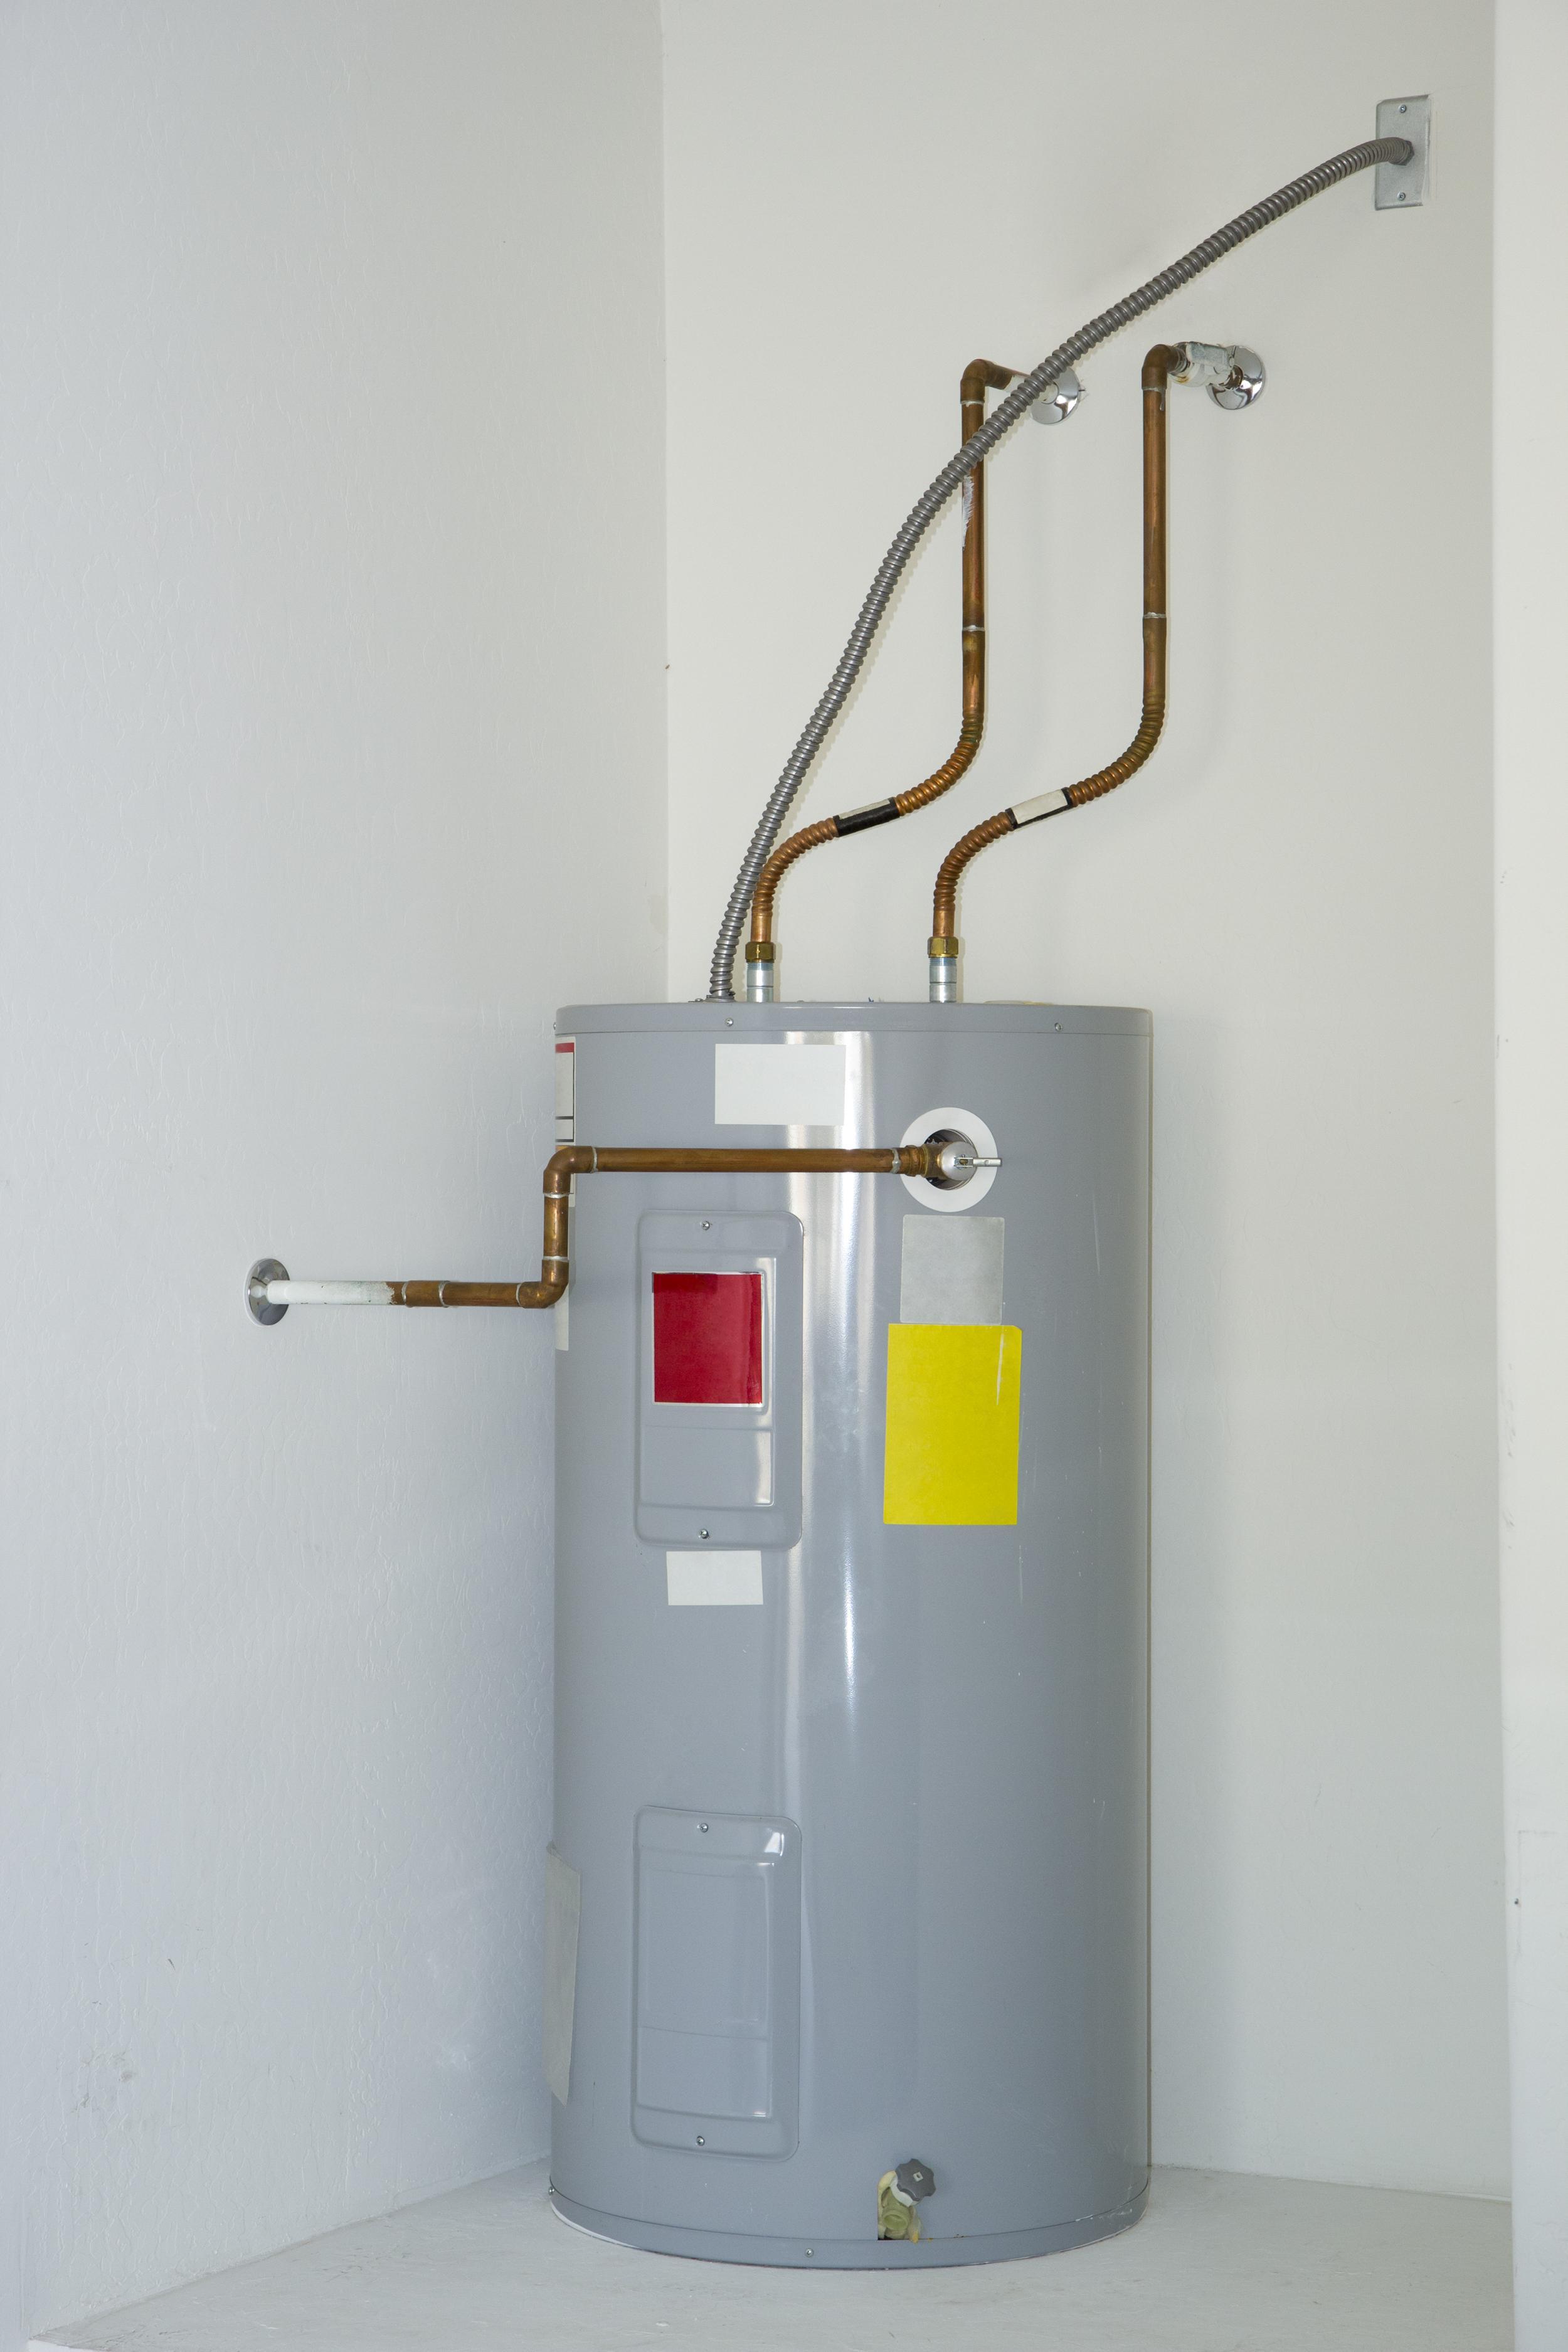 House Ac Wiring Diagram Ray May Plumbing Montclair Ca Plumbing Contractors